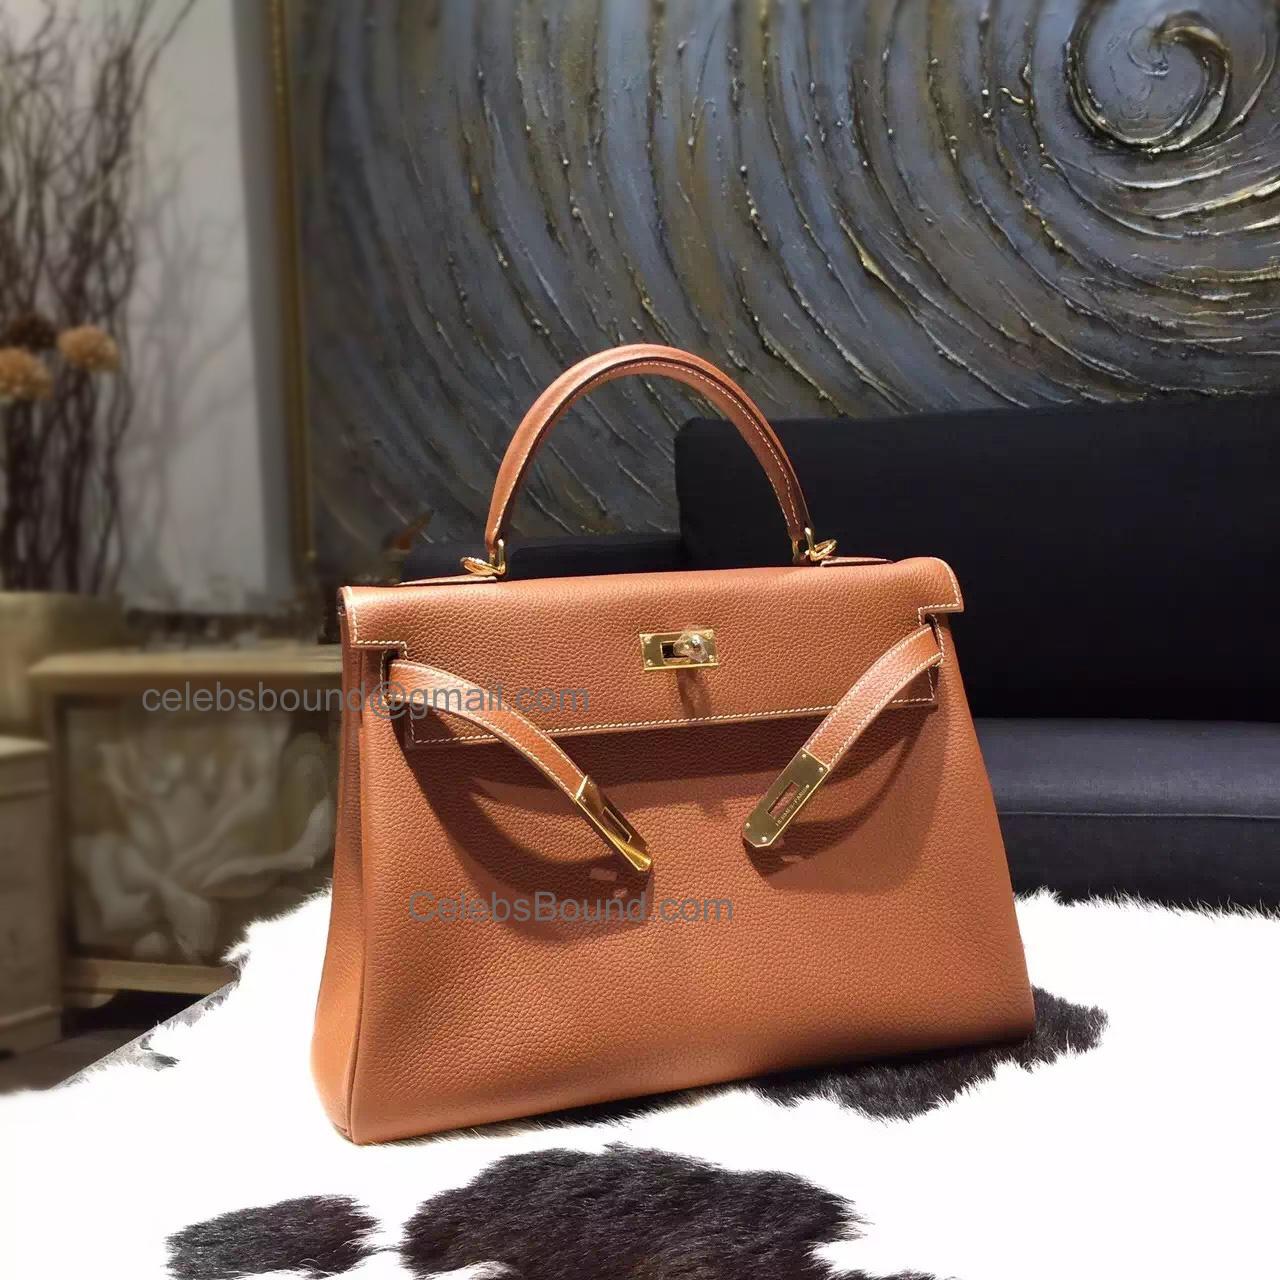 787969580e8fa Replica Hermes Kelly 28 Handmade Bag in ck37 Gold Togo Calfskin GHW -